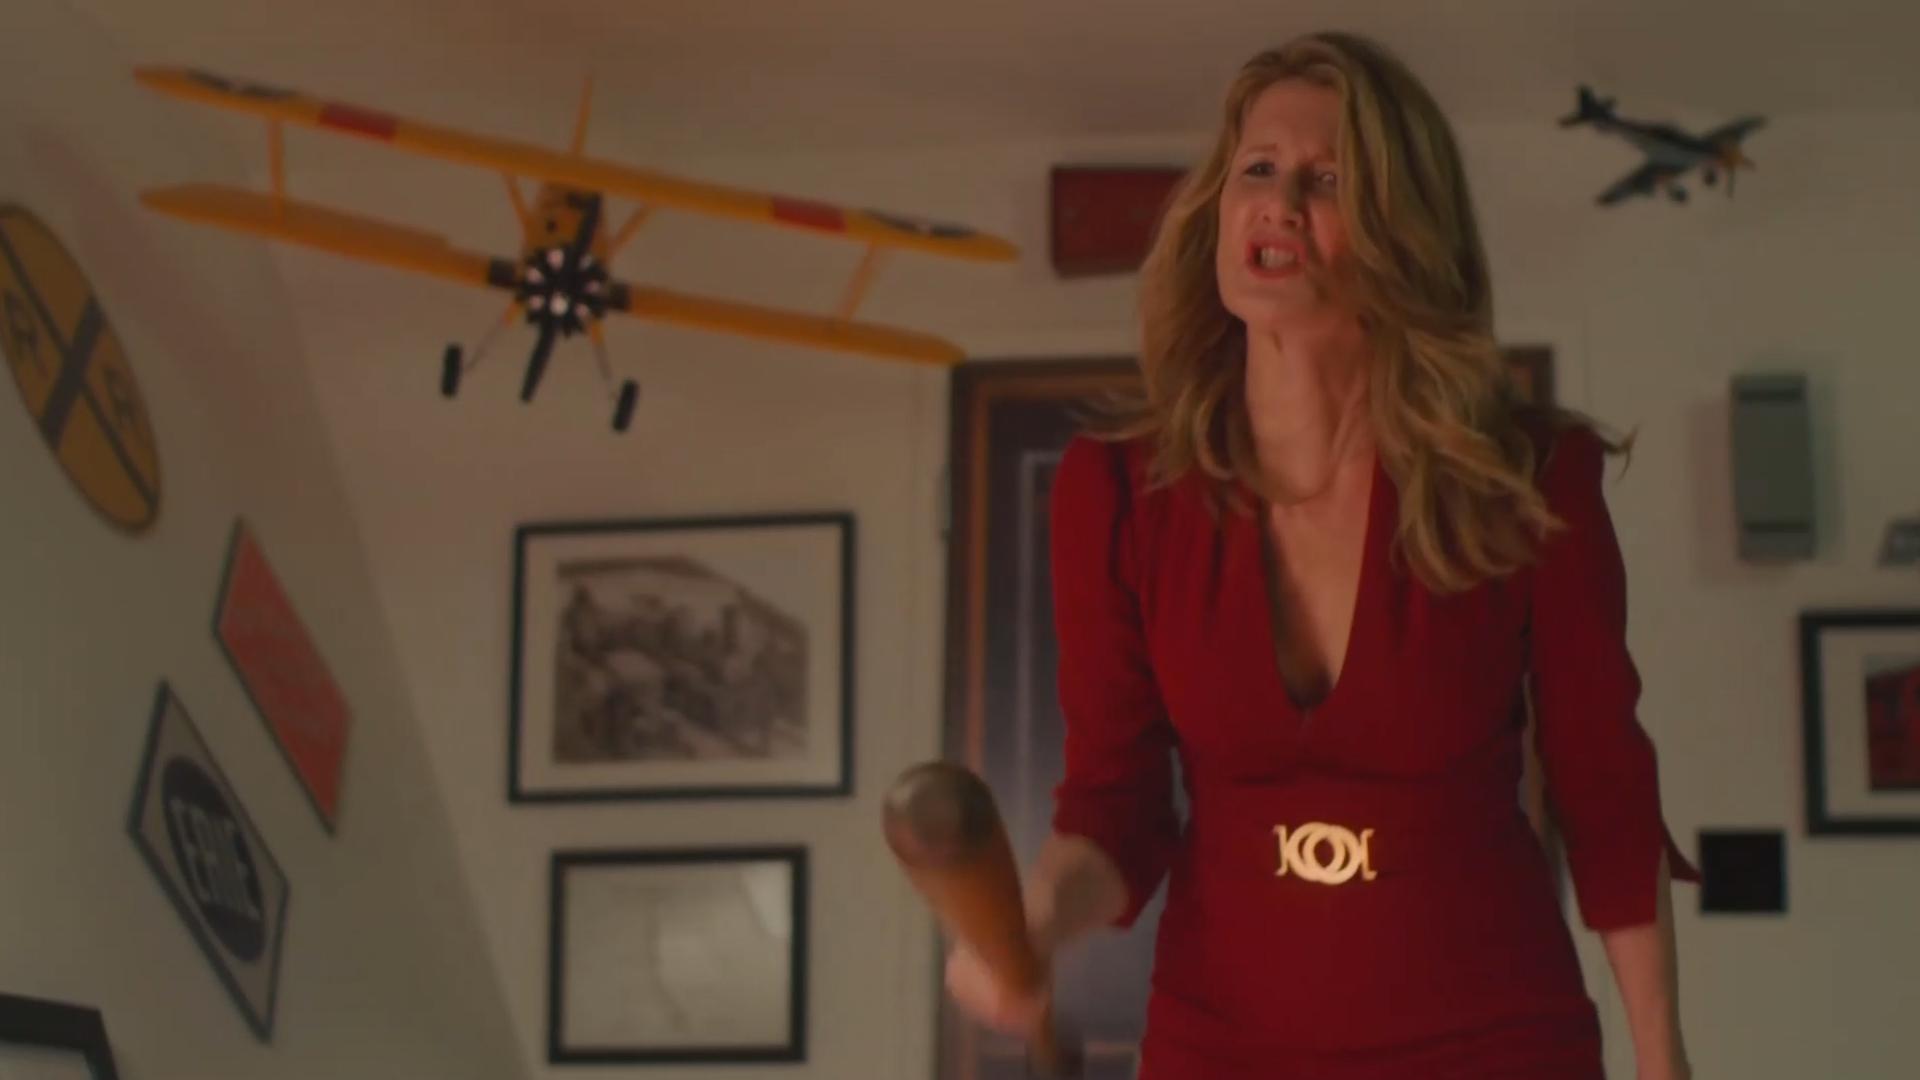 'Big Little Lies' Season 2 finale has fans asking one big question